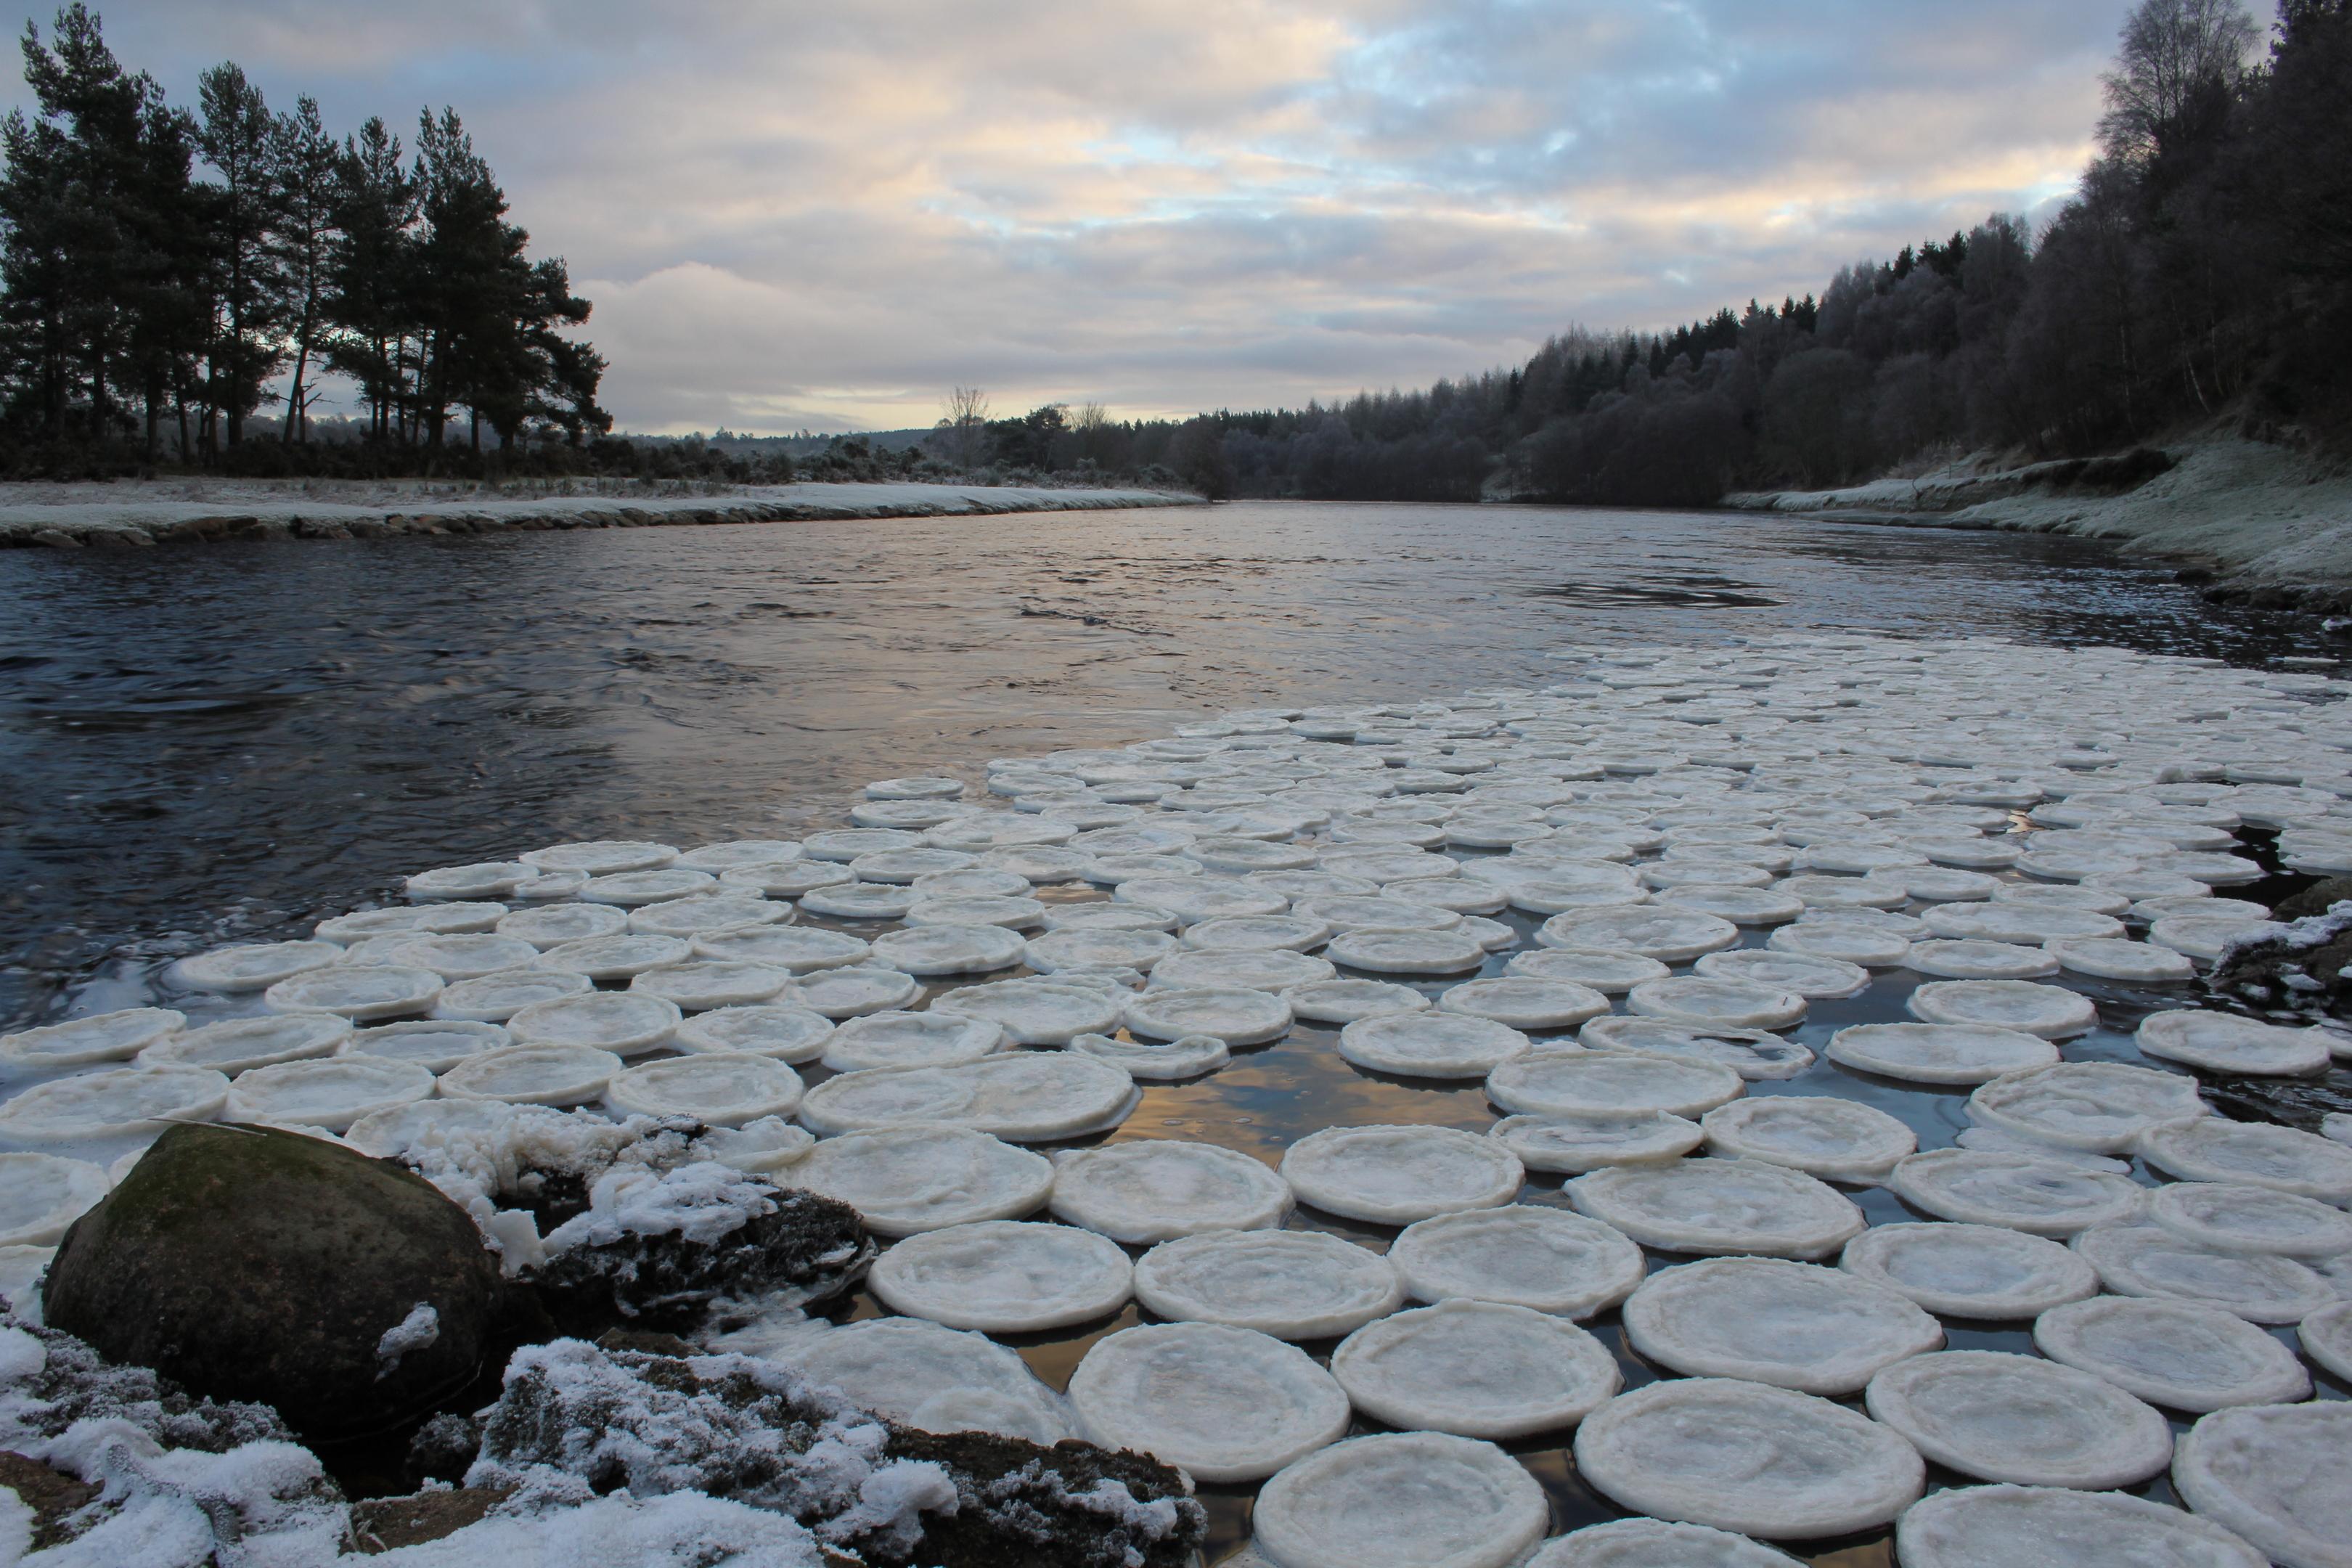 Ice pancakes at the Lummels Pool at Birse, near Aboyne